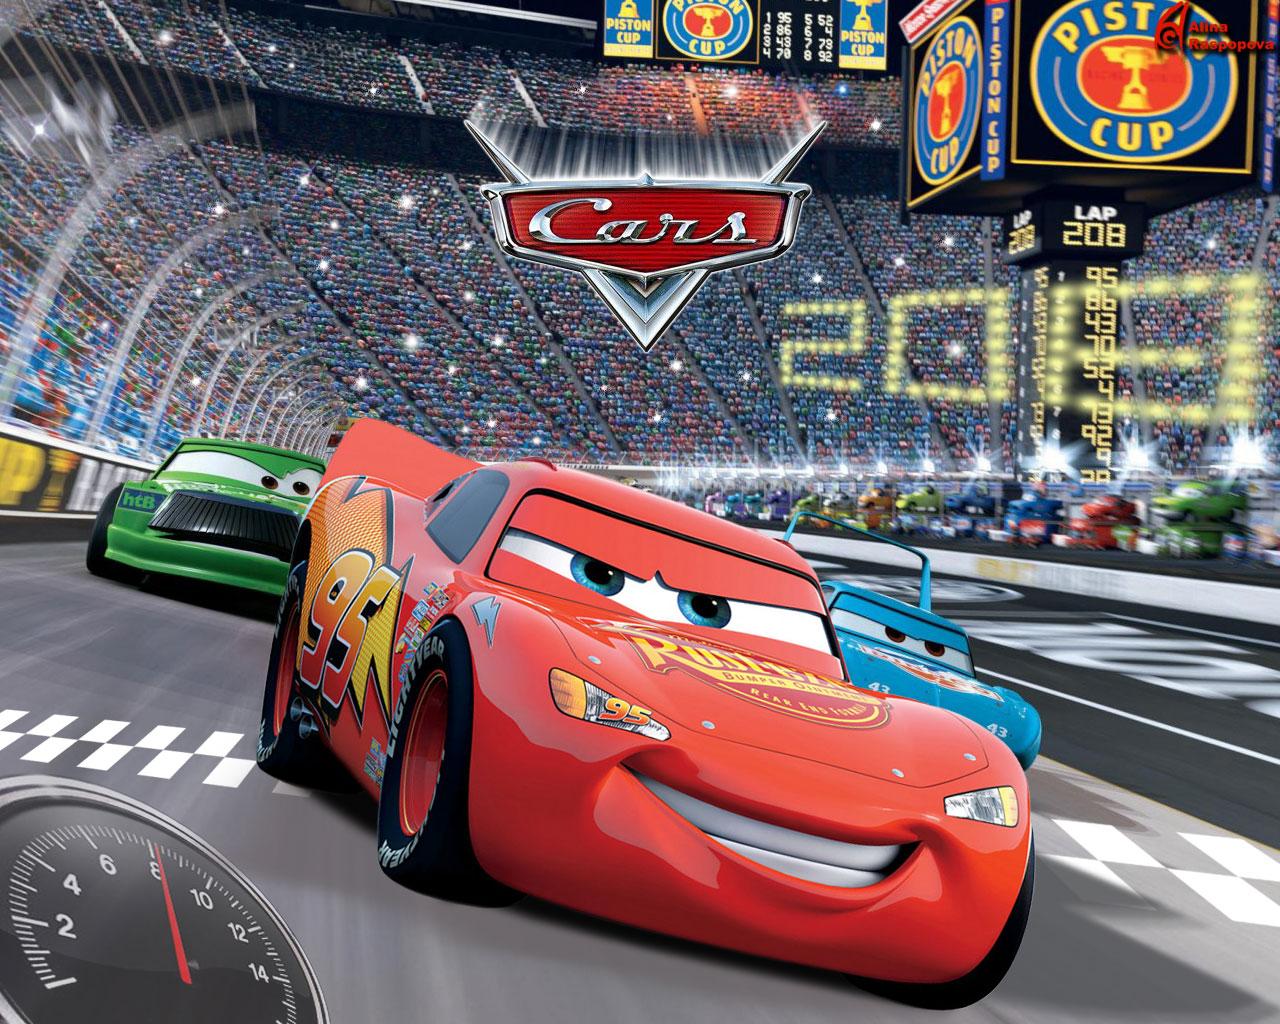 Cars news cars 2 fond la caisse - Voiture macwin ...